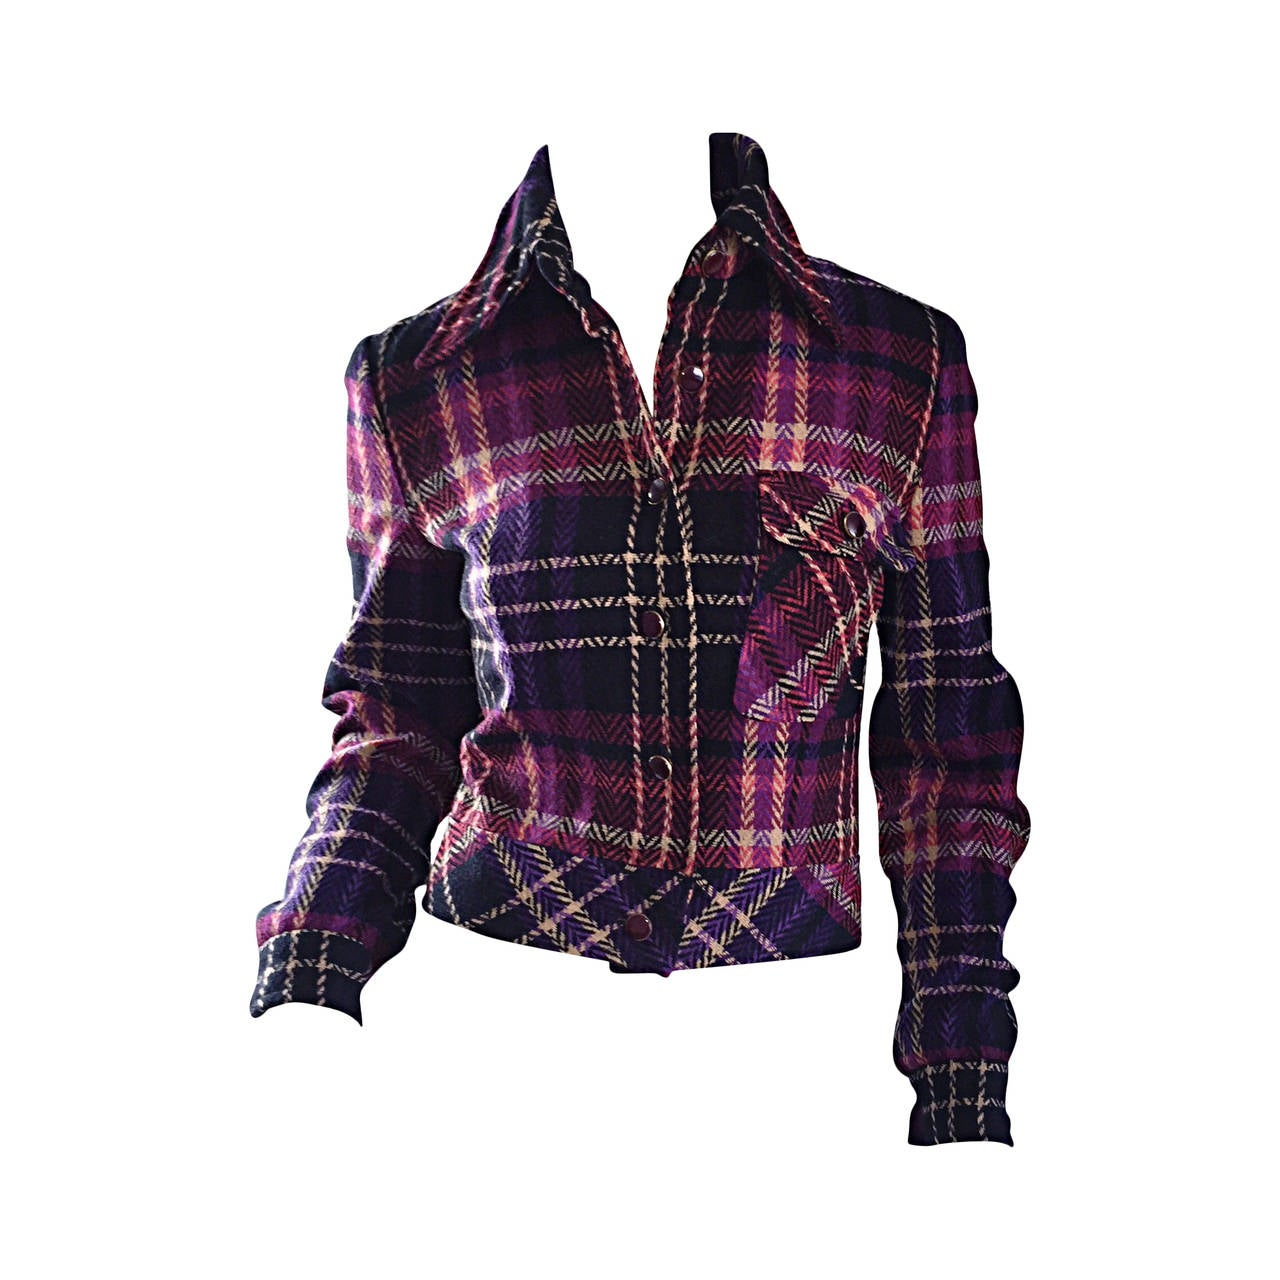 1970s Vintage Addena for I. Magnin Pink + Purple Plaid Herringbone Wool Jacket 1